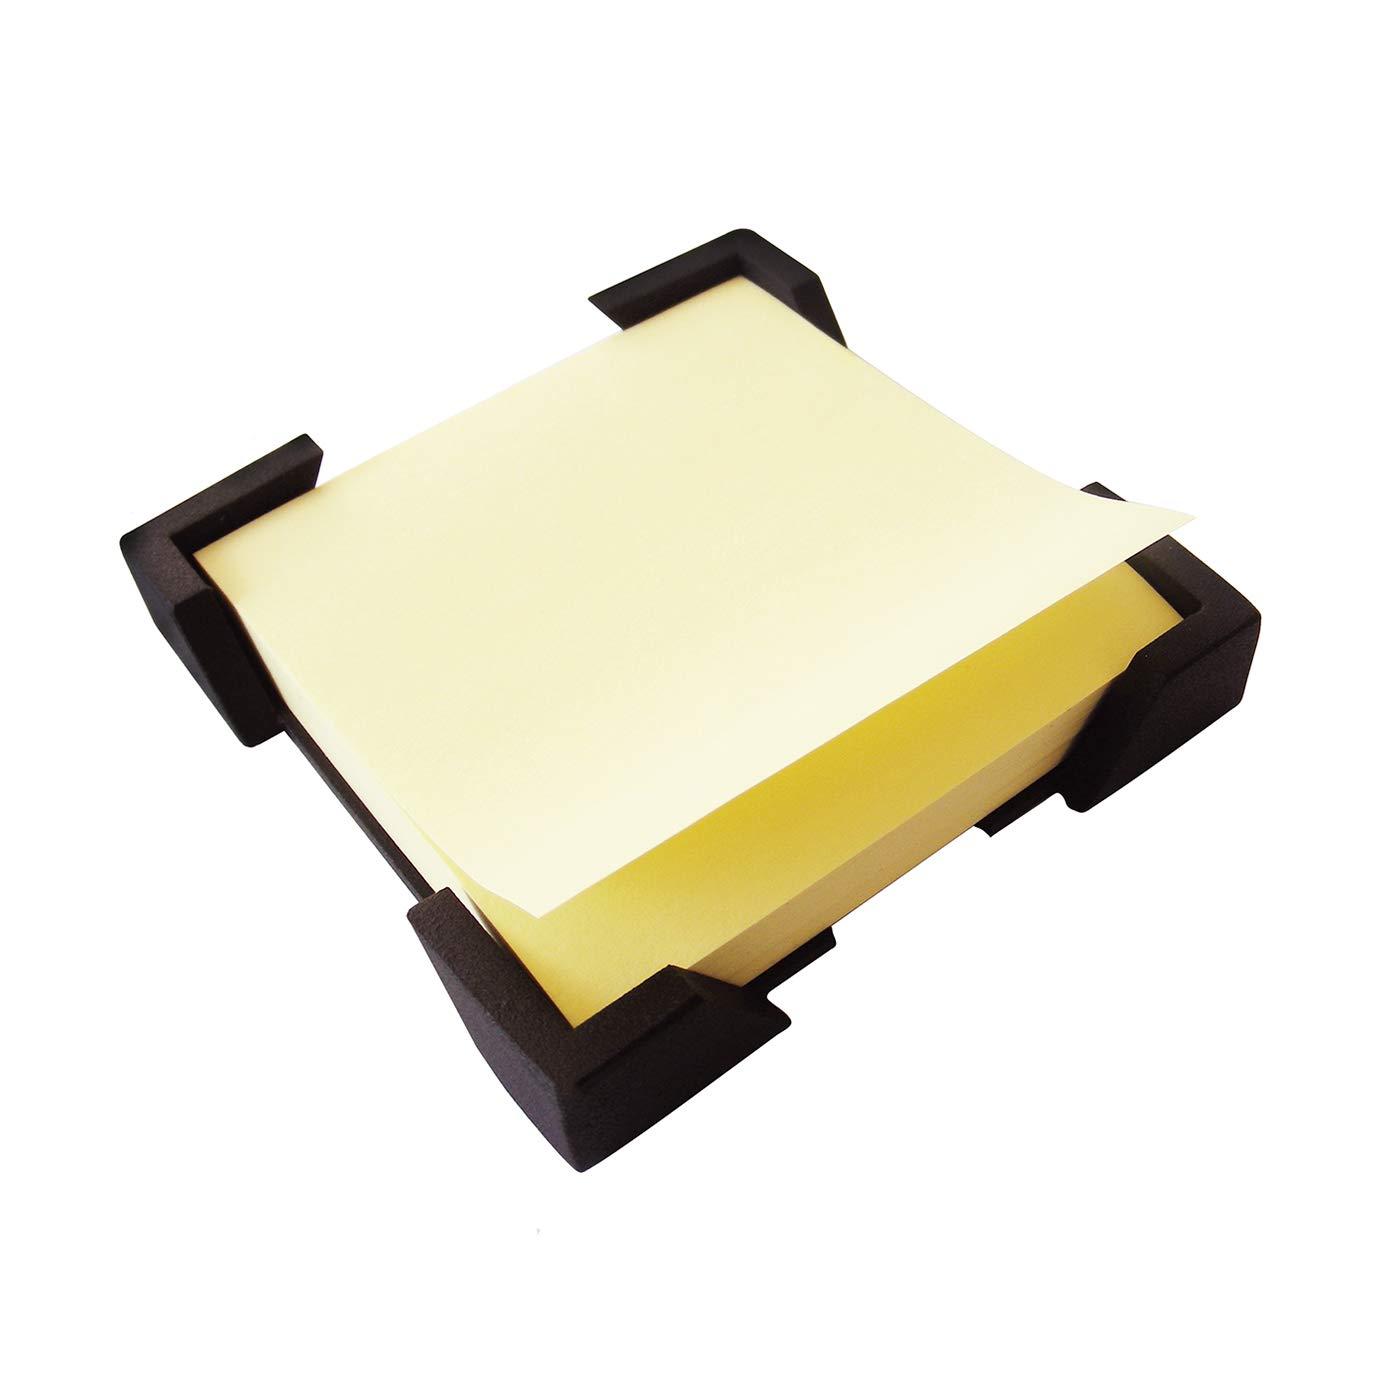 ArtsOnDesk Modern Art Note Holder/Dispenser Bk309 Steel Black Desktop Office Supply Note Pad Desk Accessory Organizer Memo Dispenser Holiday Christmas Gift Self-stick Note by ArtsOnDesk